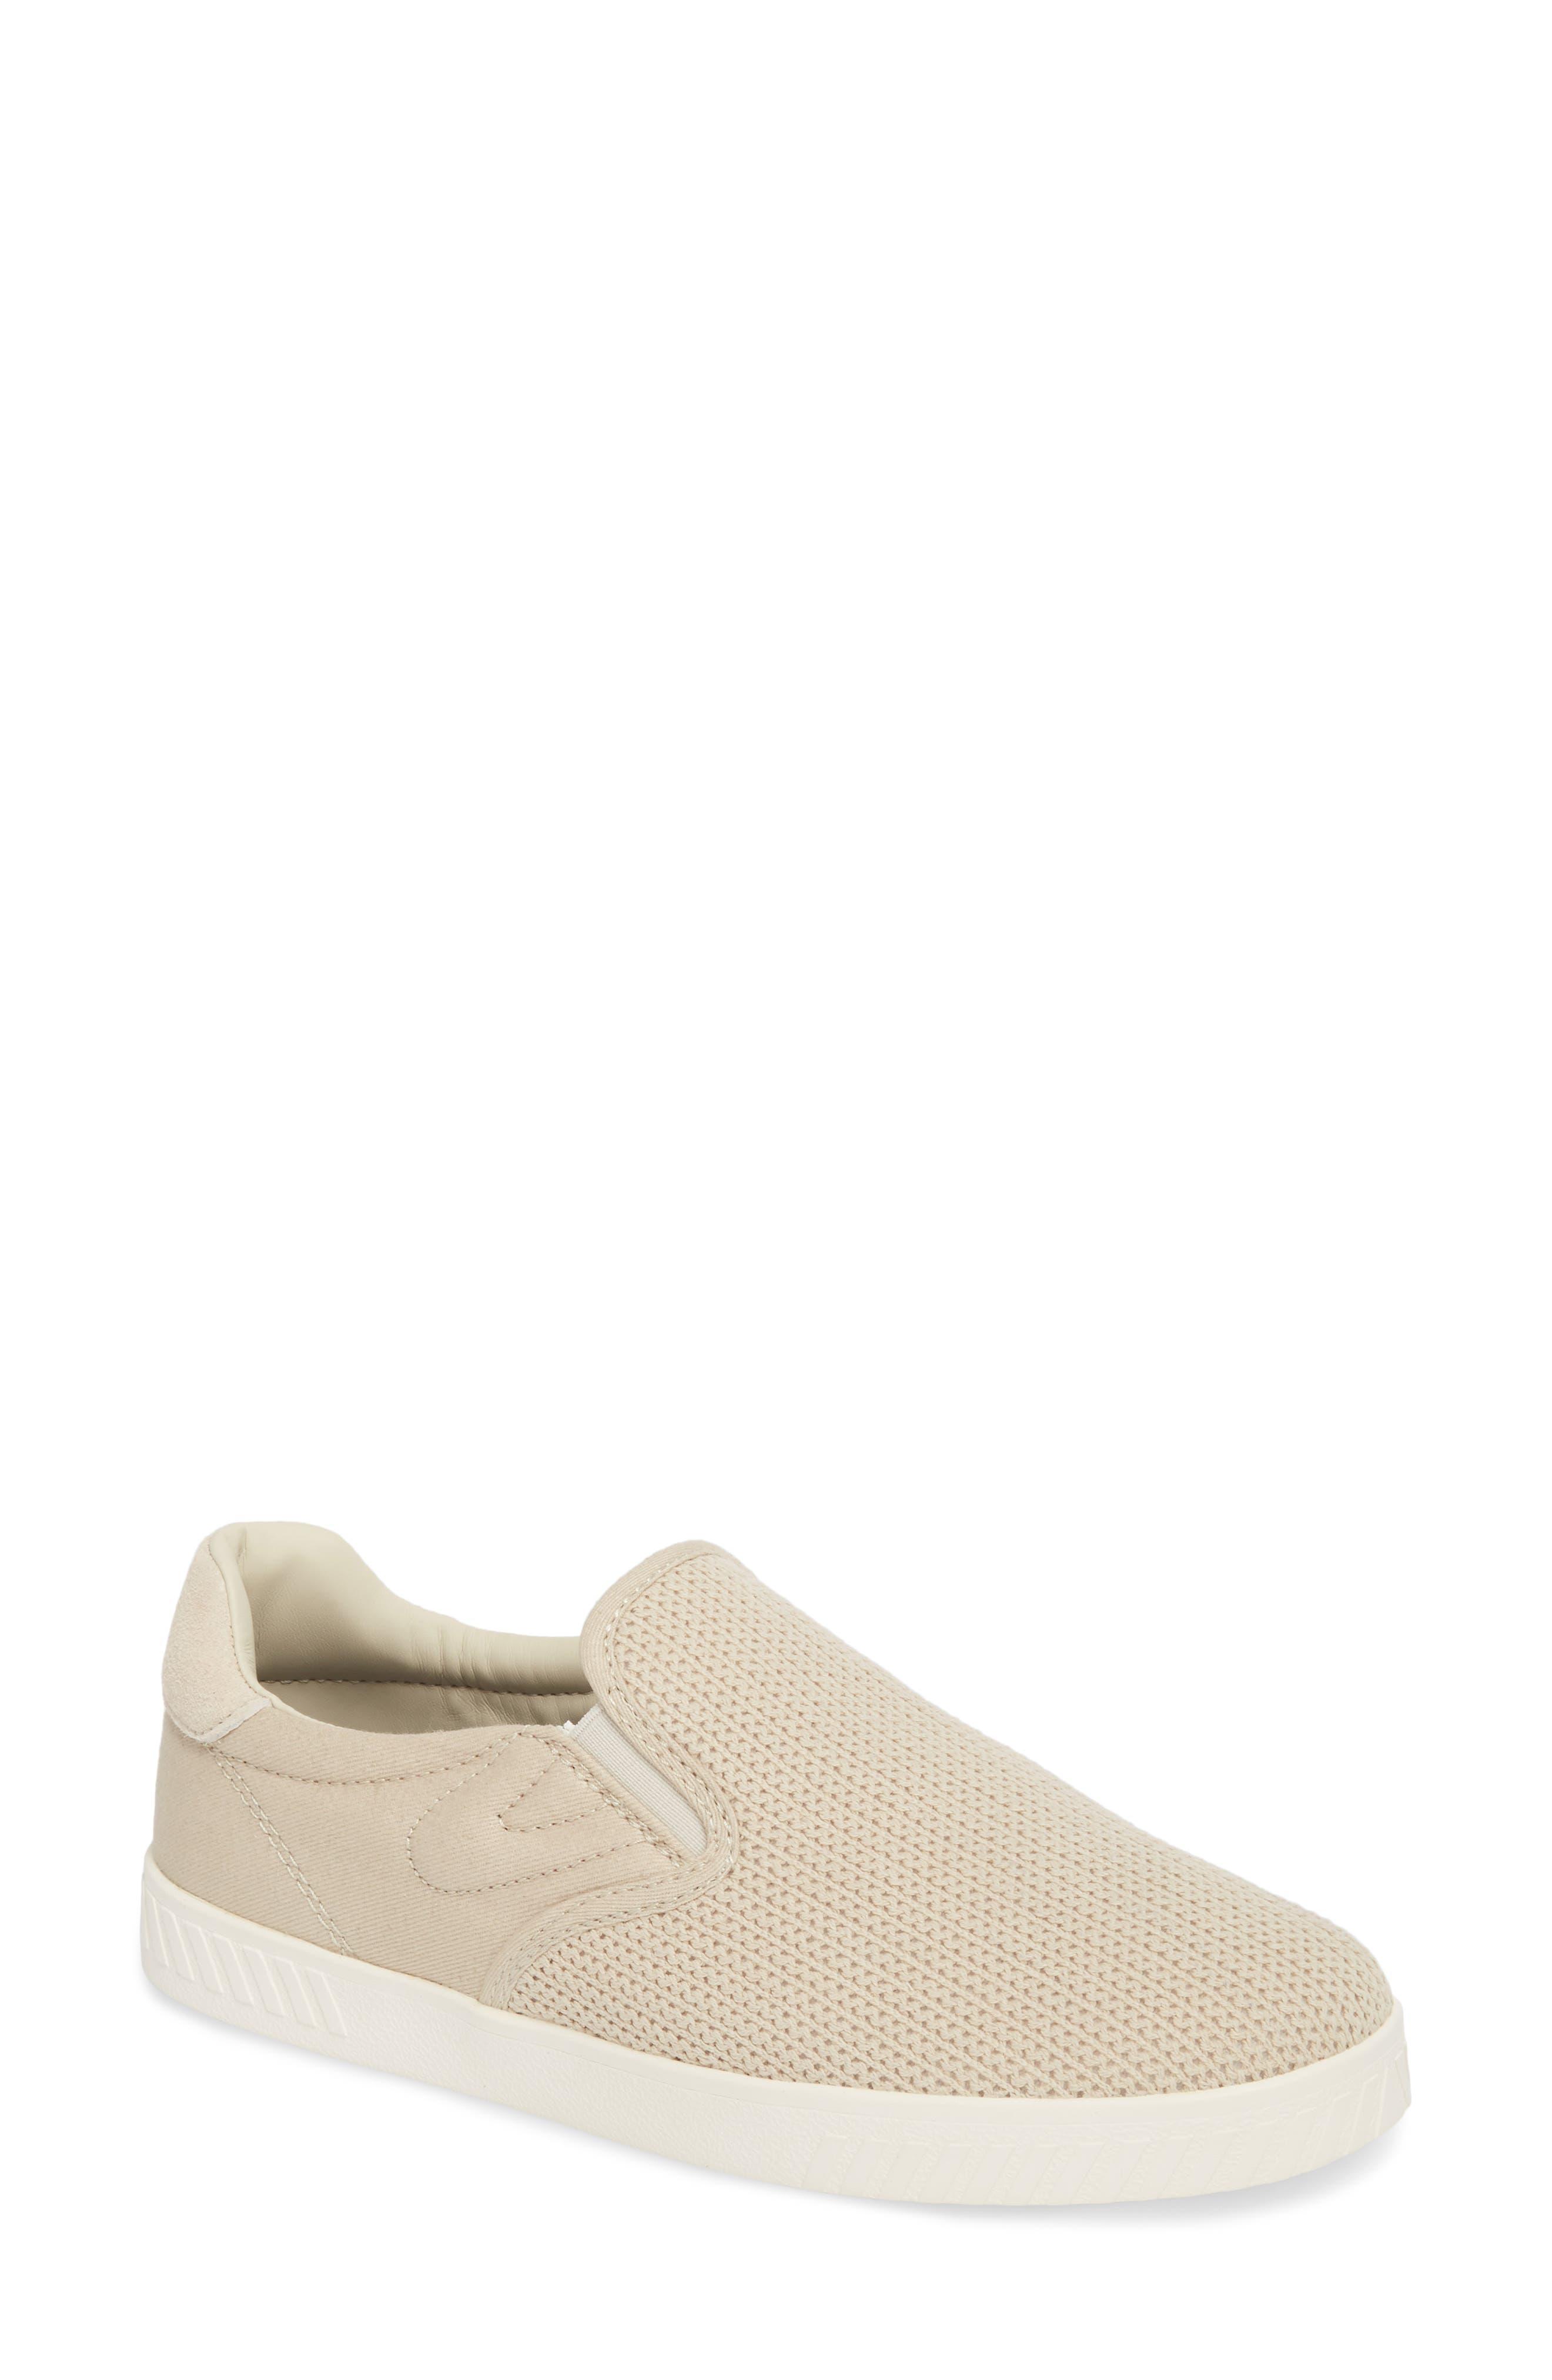 Cruz Mesh Slip-On Sneaker,                             Main thumbnail 1, color,                             Sand